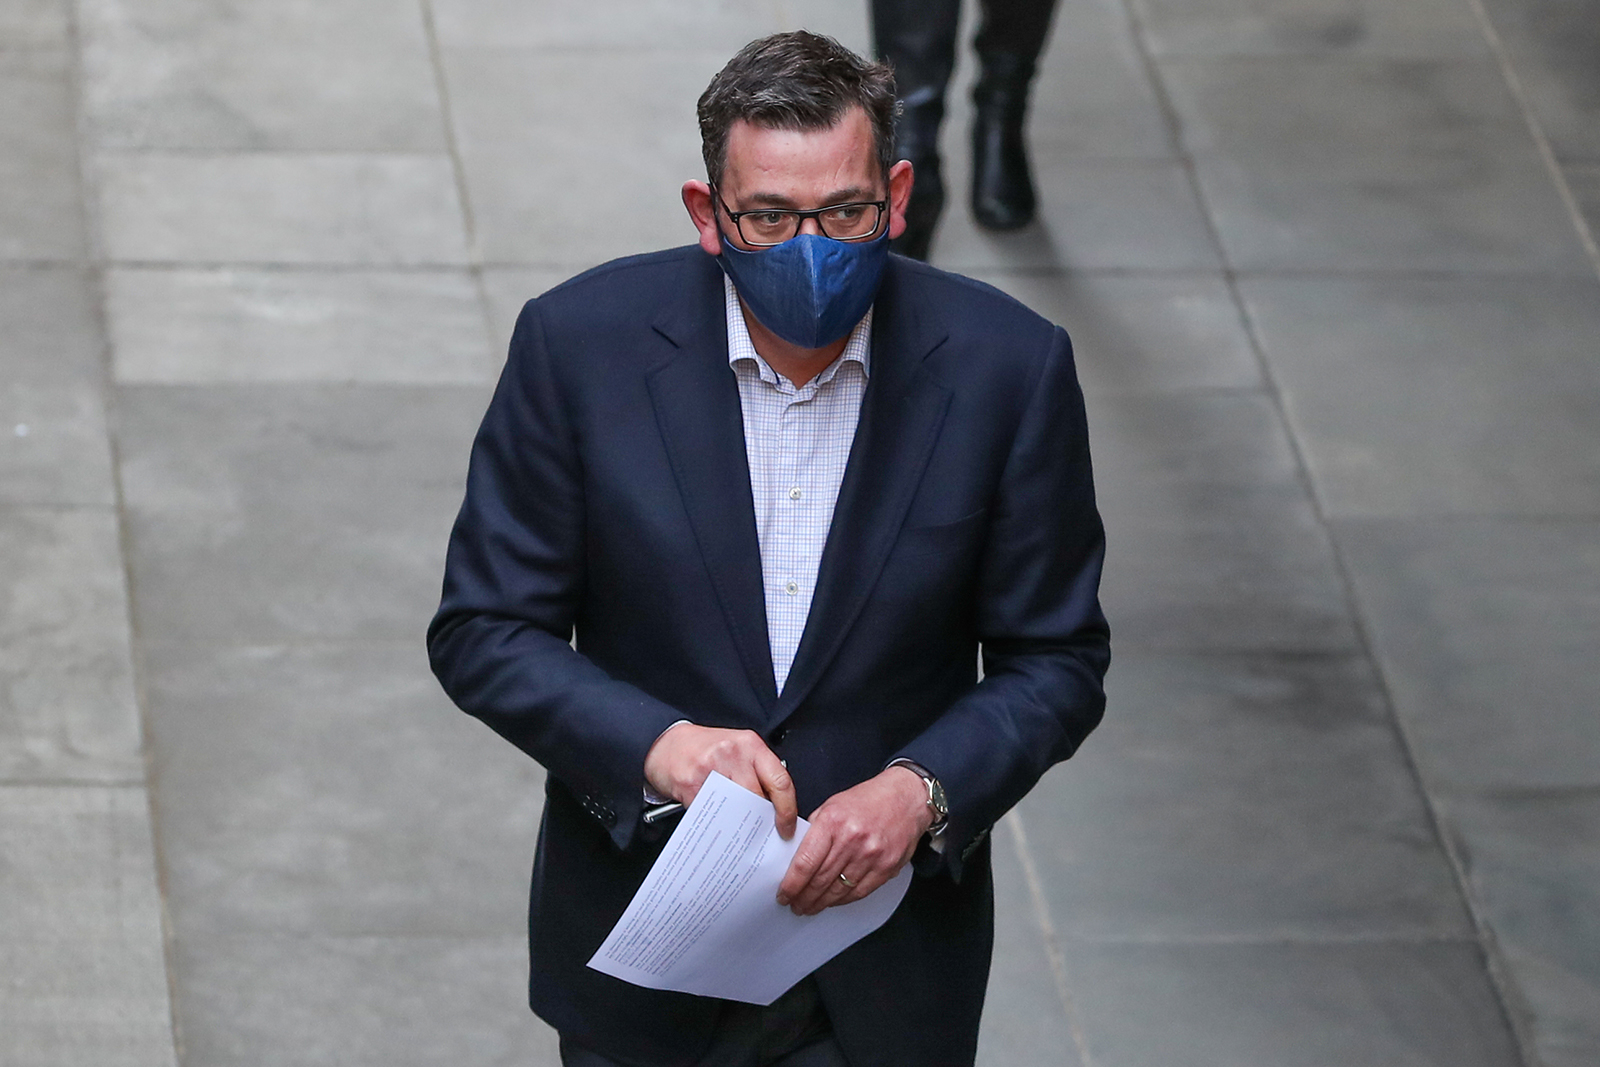 Premier Daniel Andrews wearing a mask arrives for a press conference in Melbourne, Australia  on July 24.